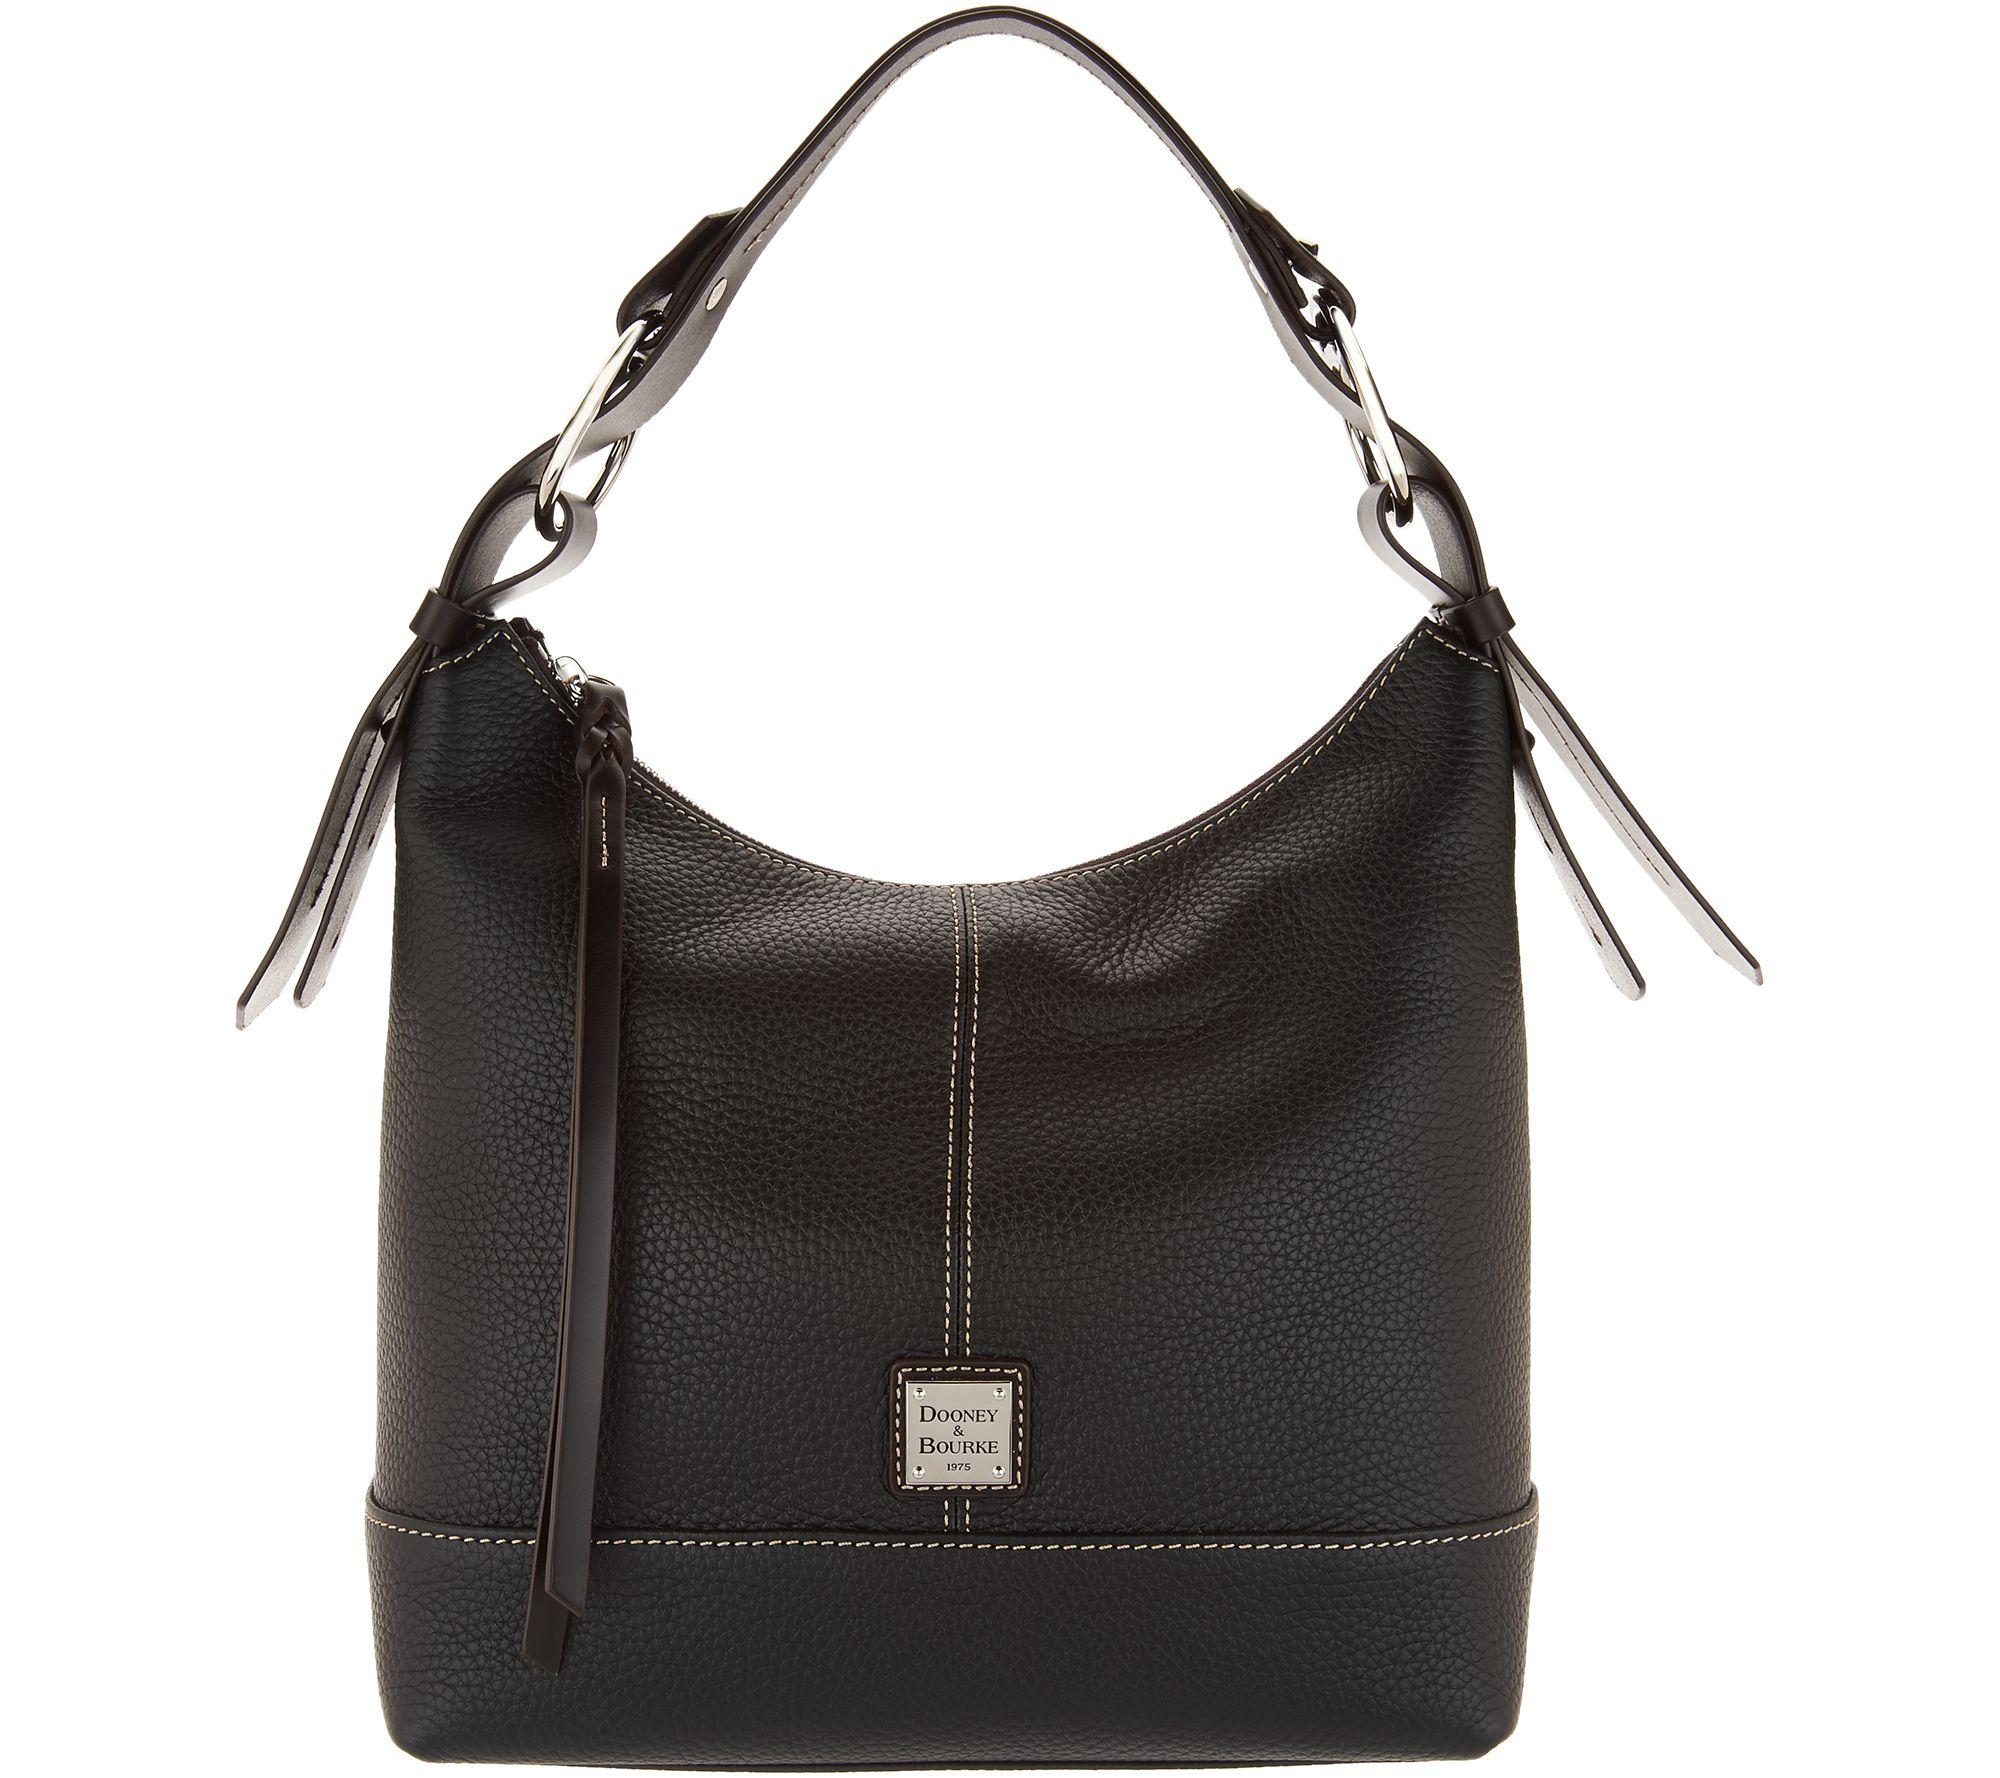 44c1b6e073f2 Dooney   Bourke Pebble Leather Hobo Handbag- Gracie - Page 1 — QVC.com